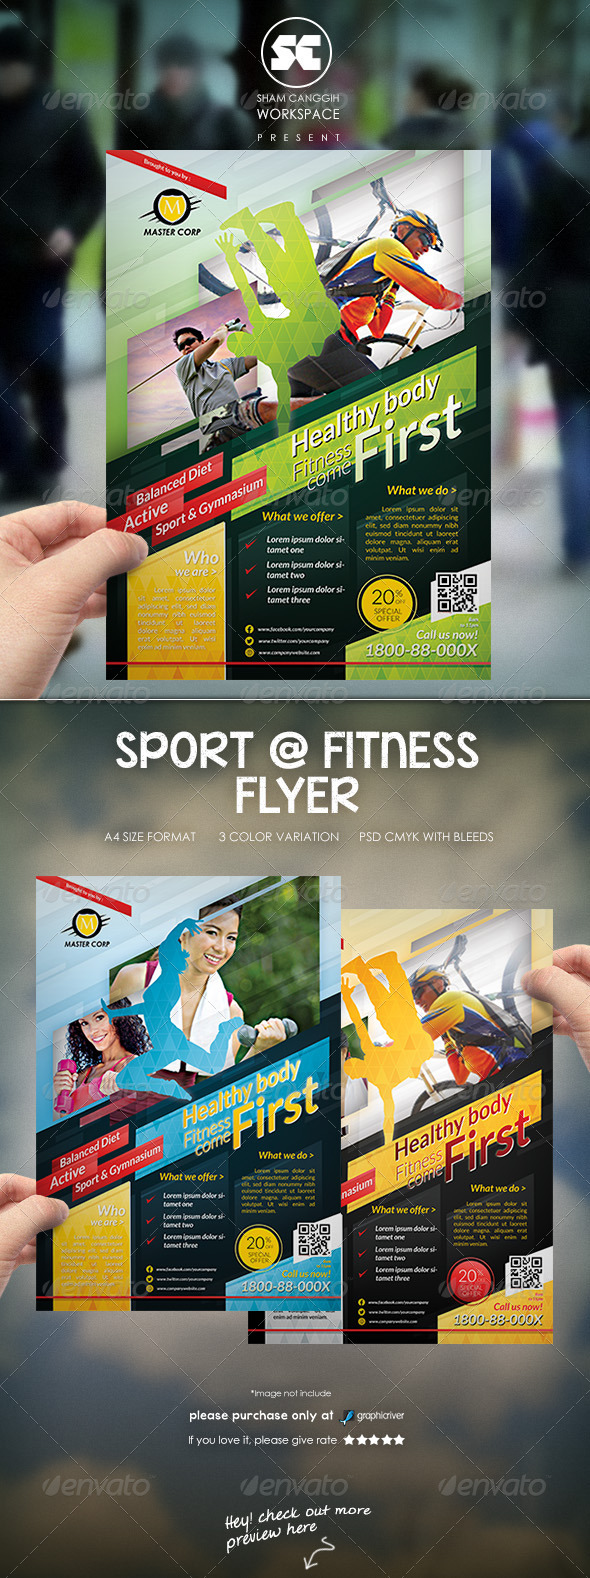 Sports & Fitness Flyer/Magazine Ads - Sports Events